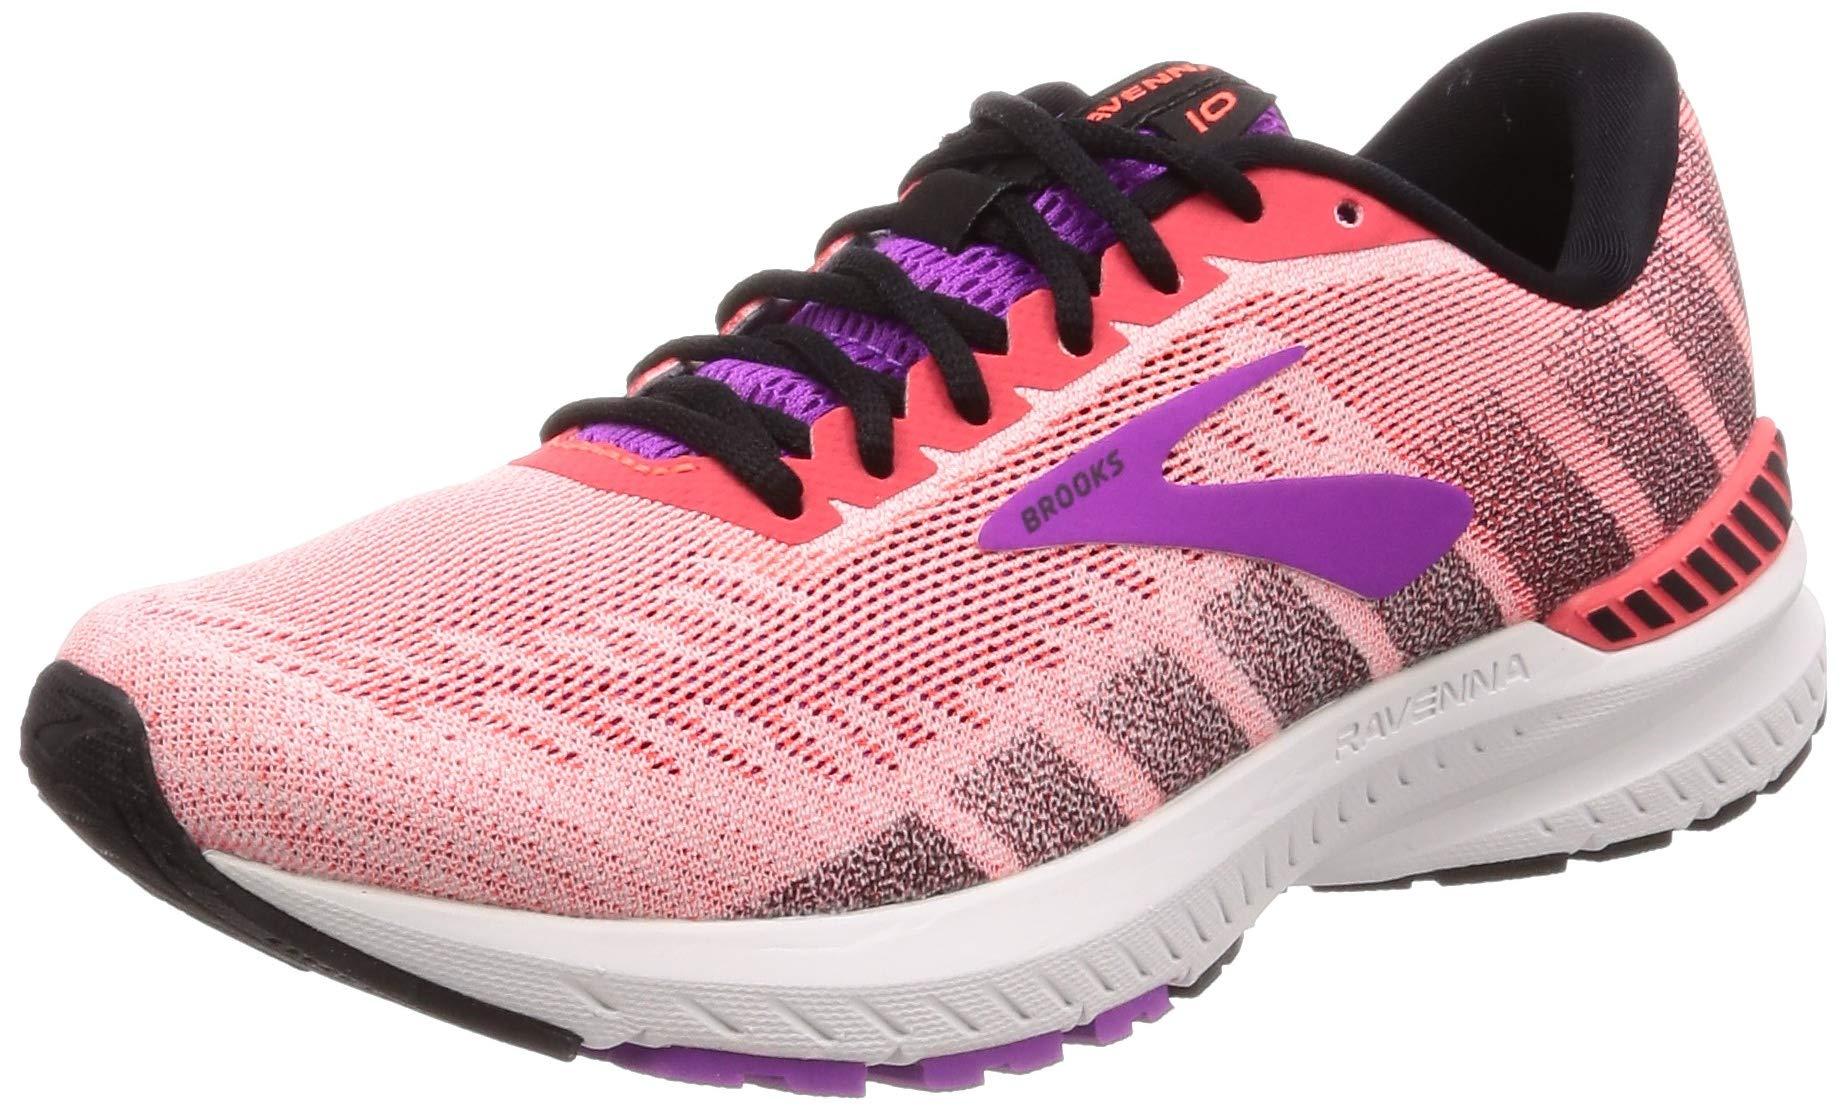 7496e8ec63e Brooks Women s Ravenna 10 Running Shoes - UKsportsOutdoors